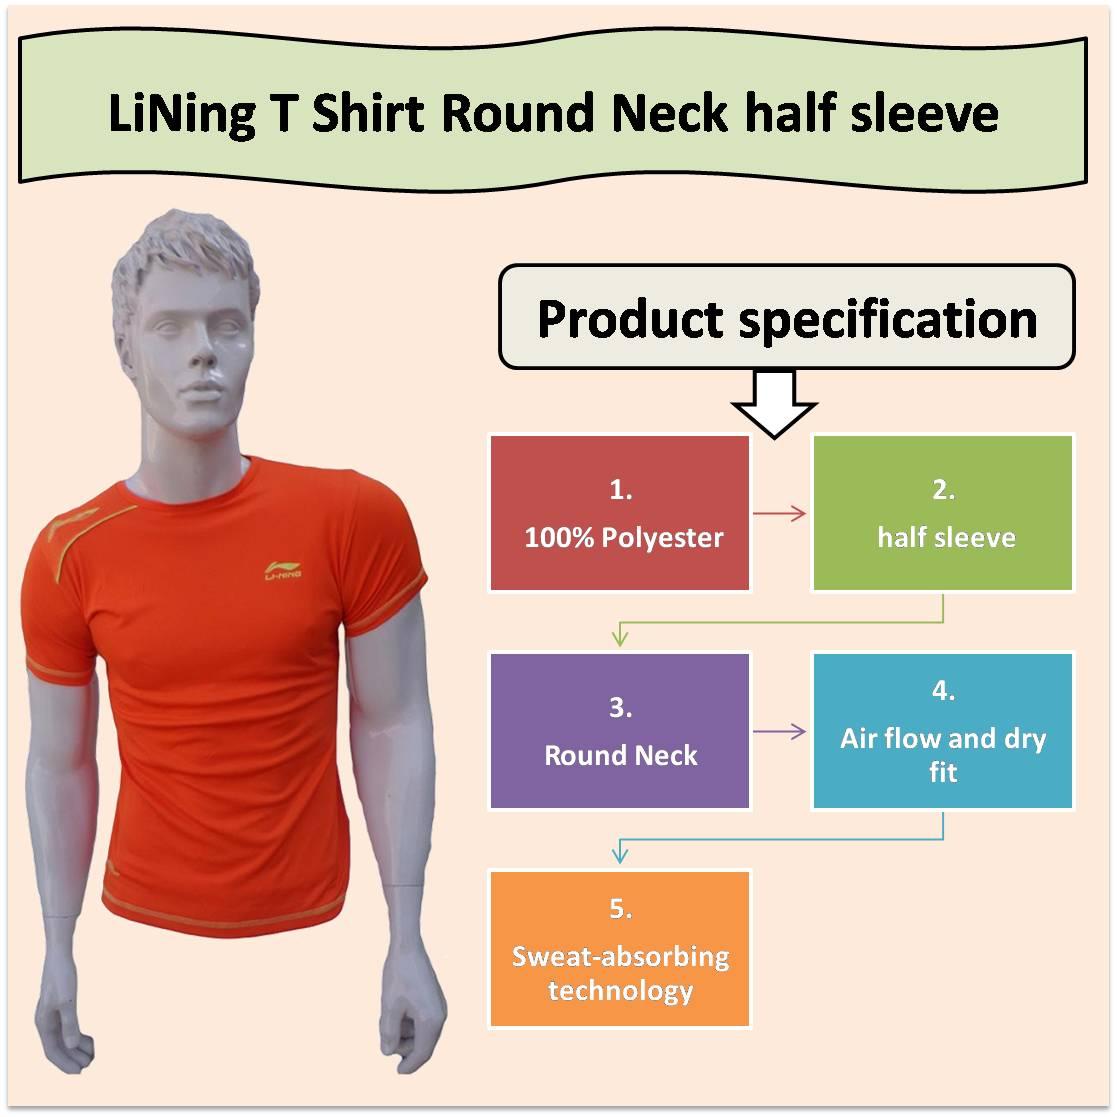 LiNing T Shirt Round Neck half sleeve Orange